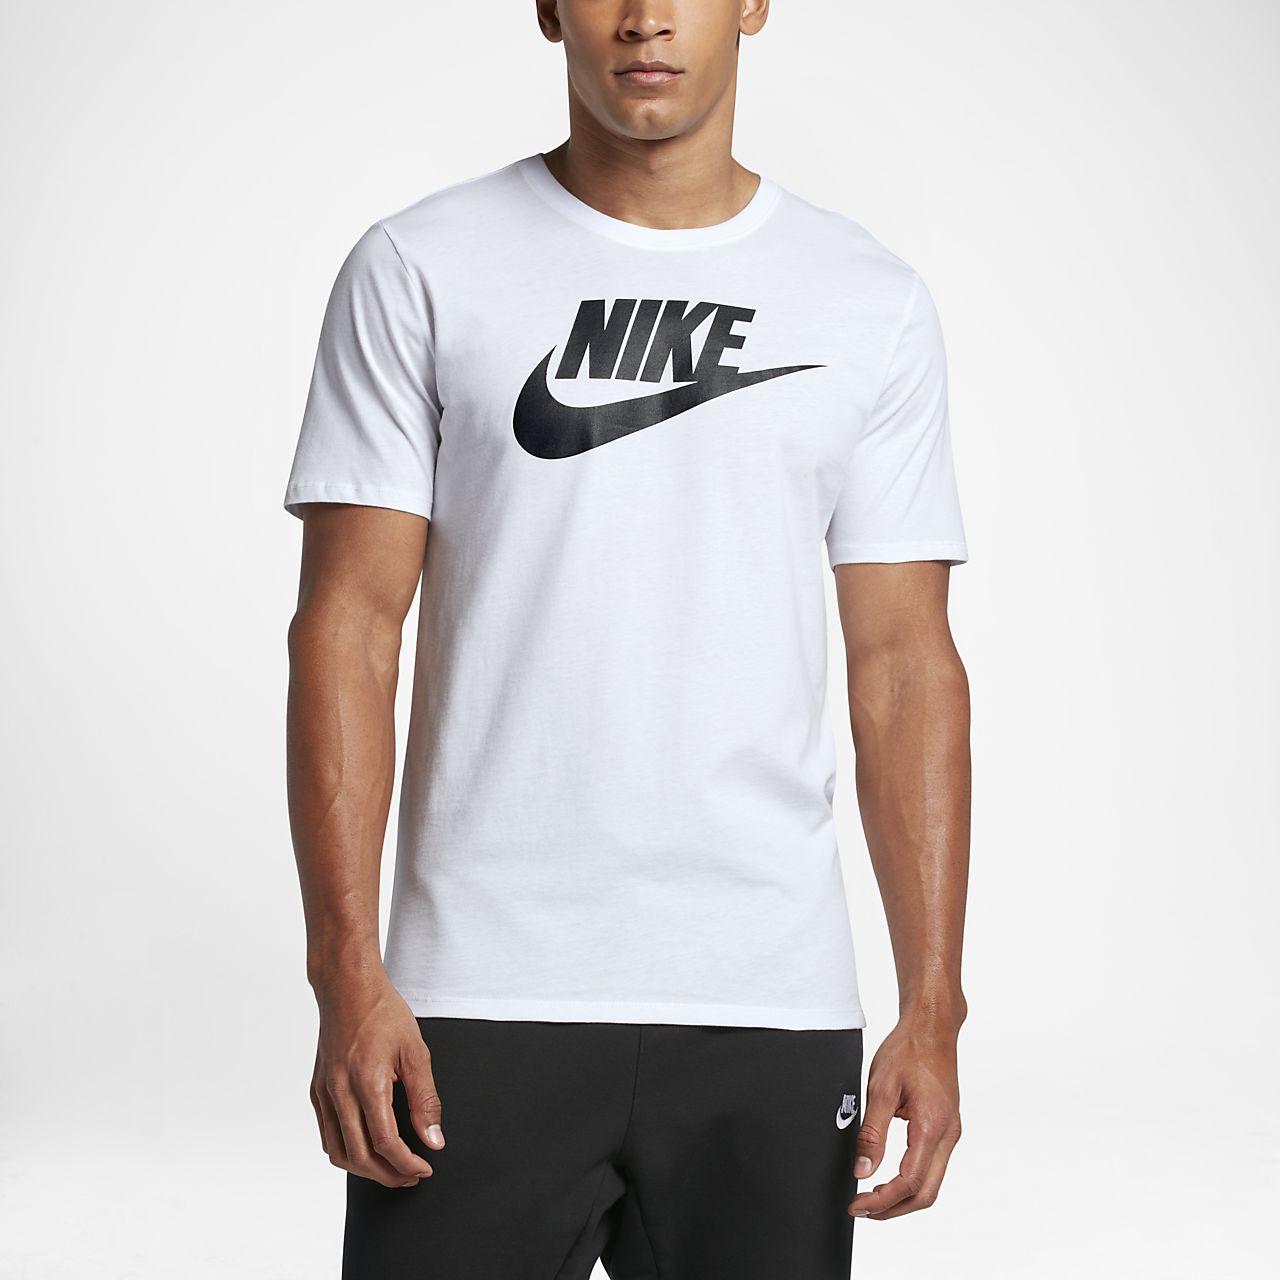 0ac53e0797e7 Nike Futura Icon Men s T-Shirt. Nike.com IN